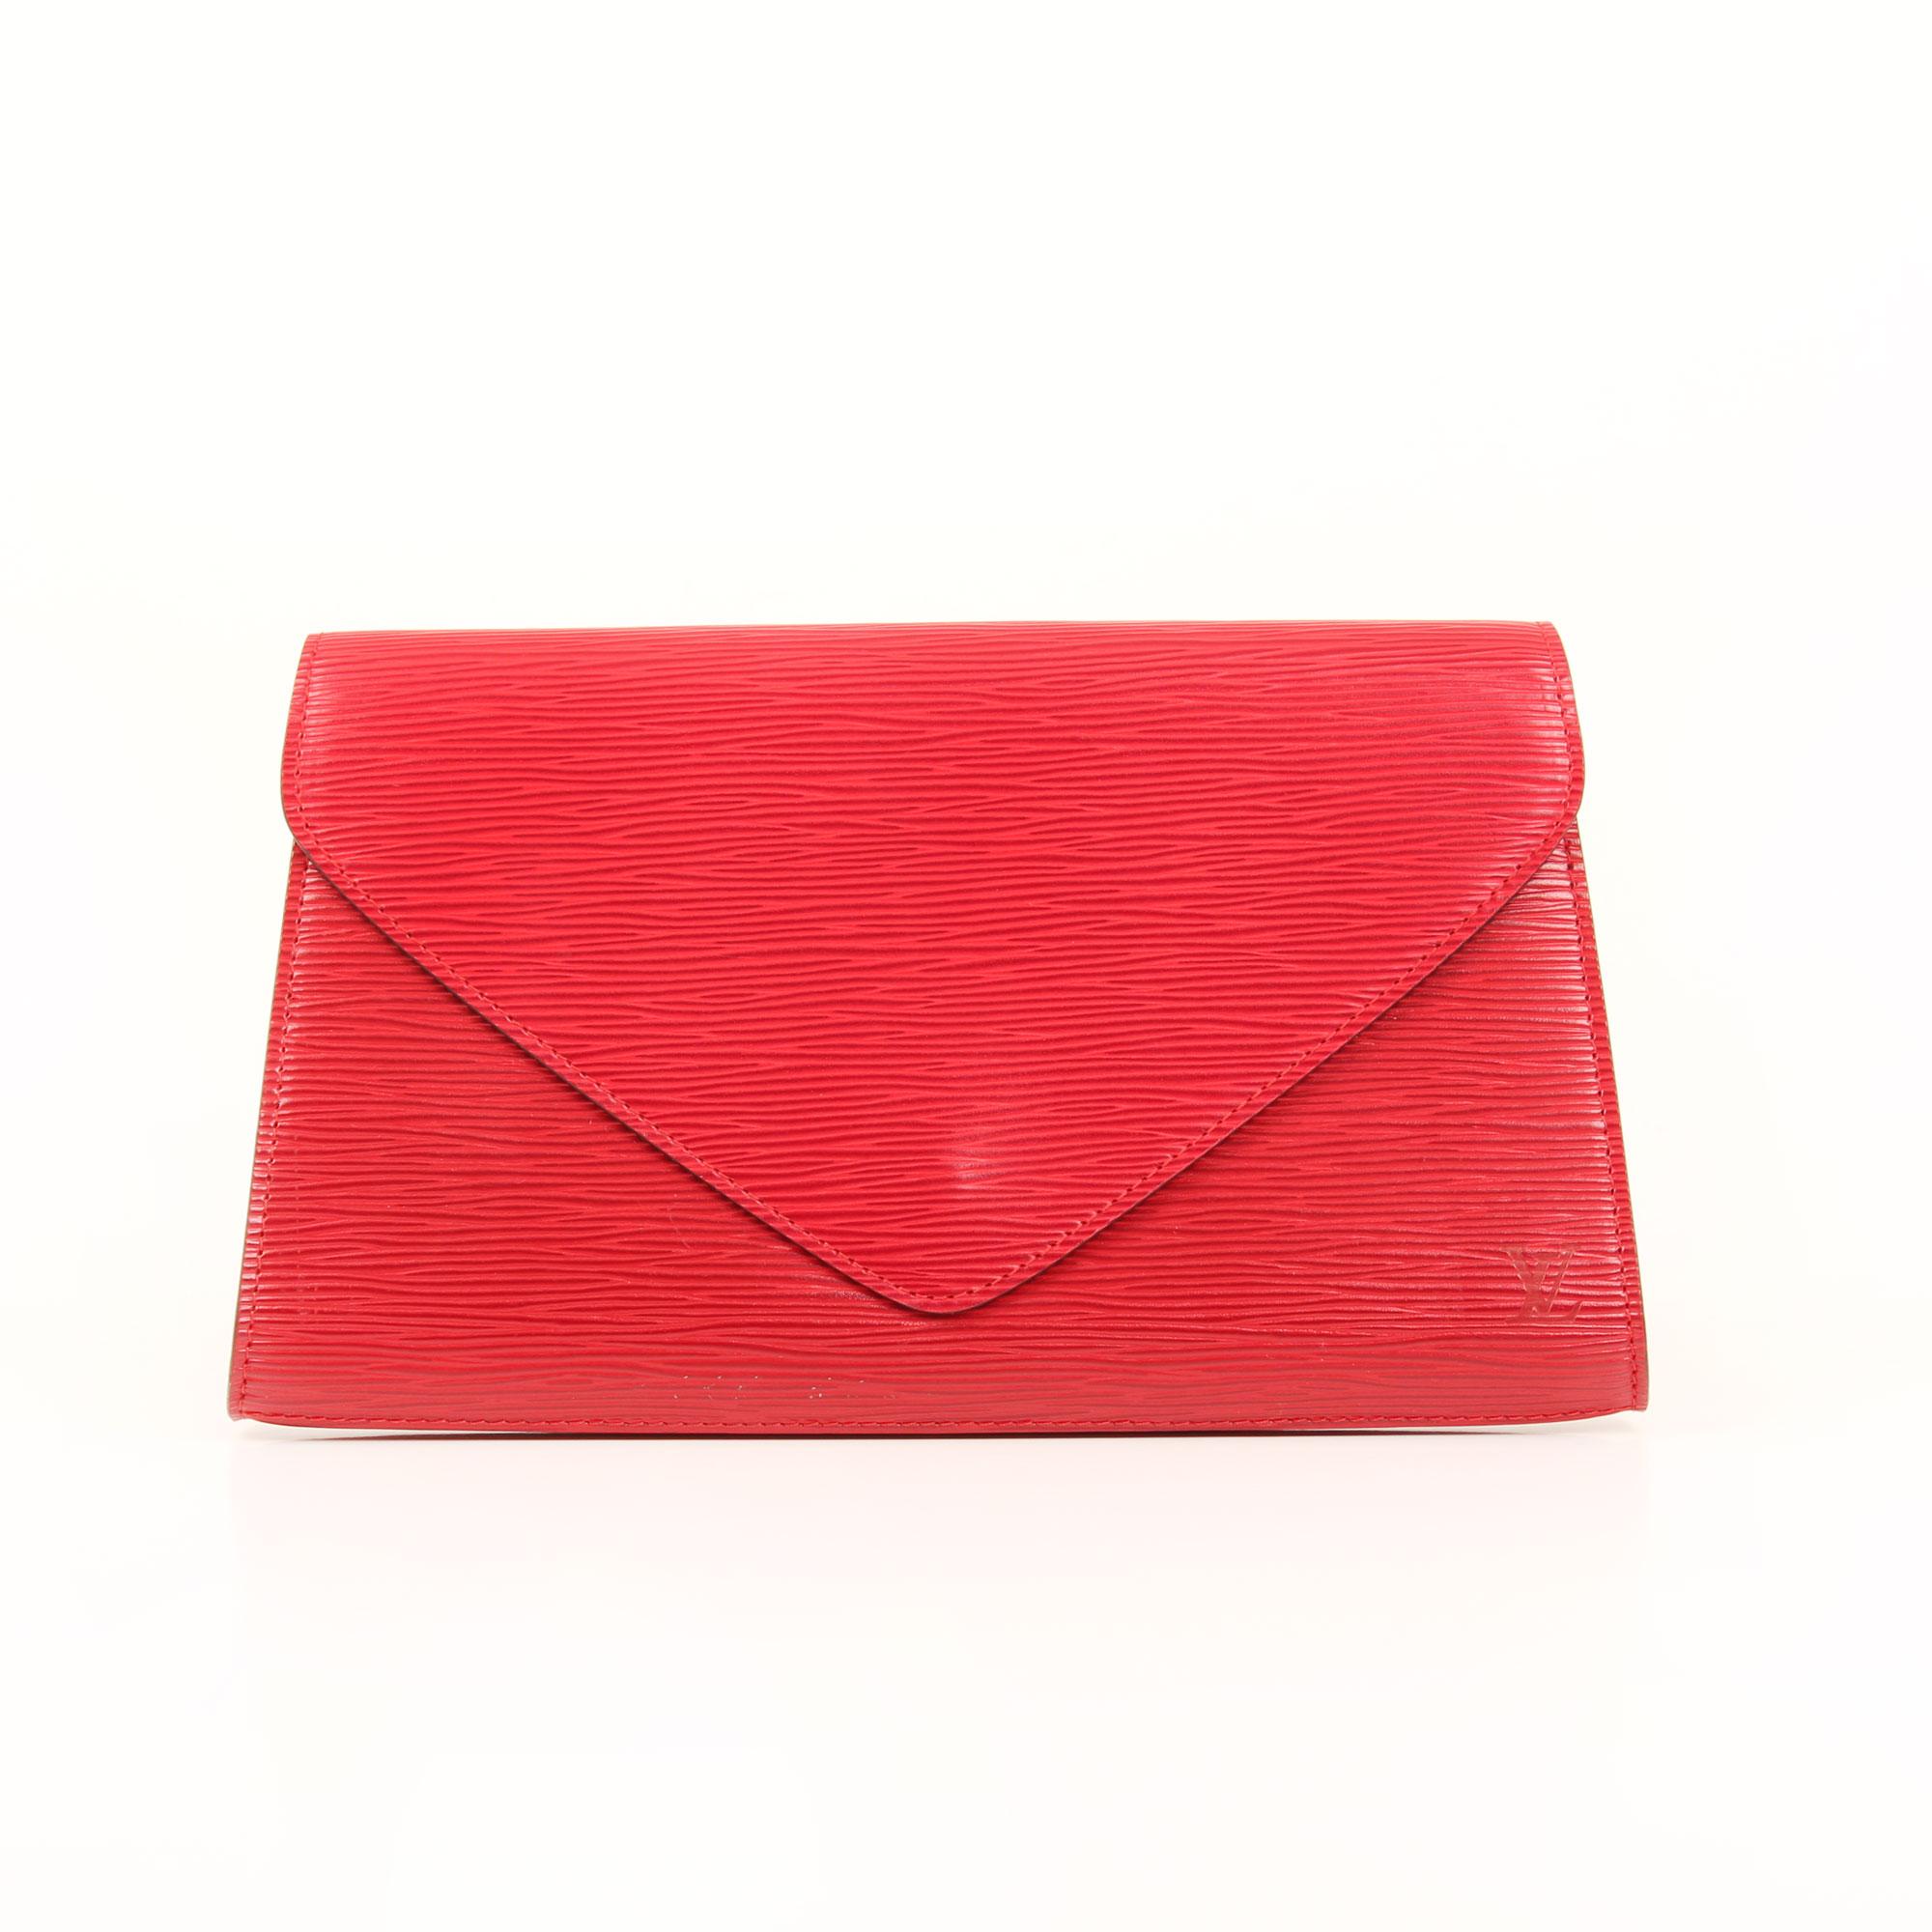 Imagen frontal del clutch louis vuitton vintage piel epi rojo